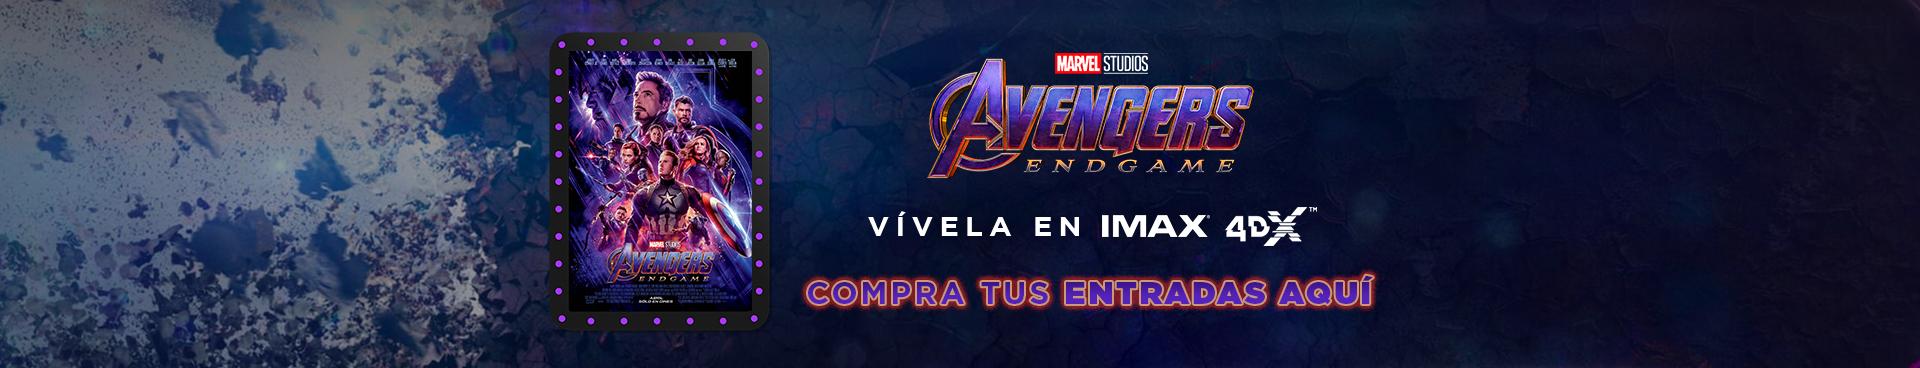 AVENGERS: ENDGAME, VIVELA EN IMAX Y 4DX, COMPRA TU ENTRADAS AQUÍ